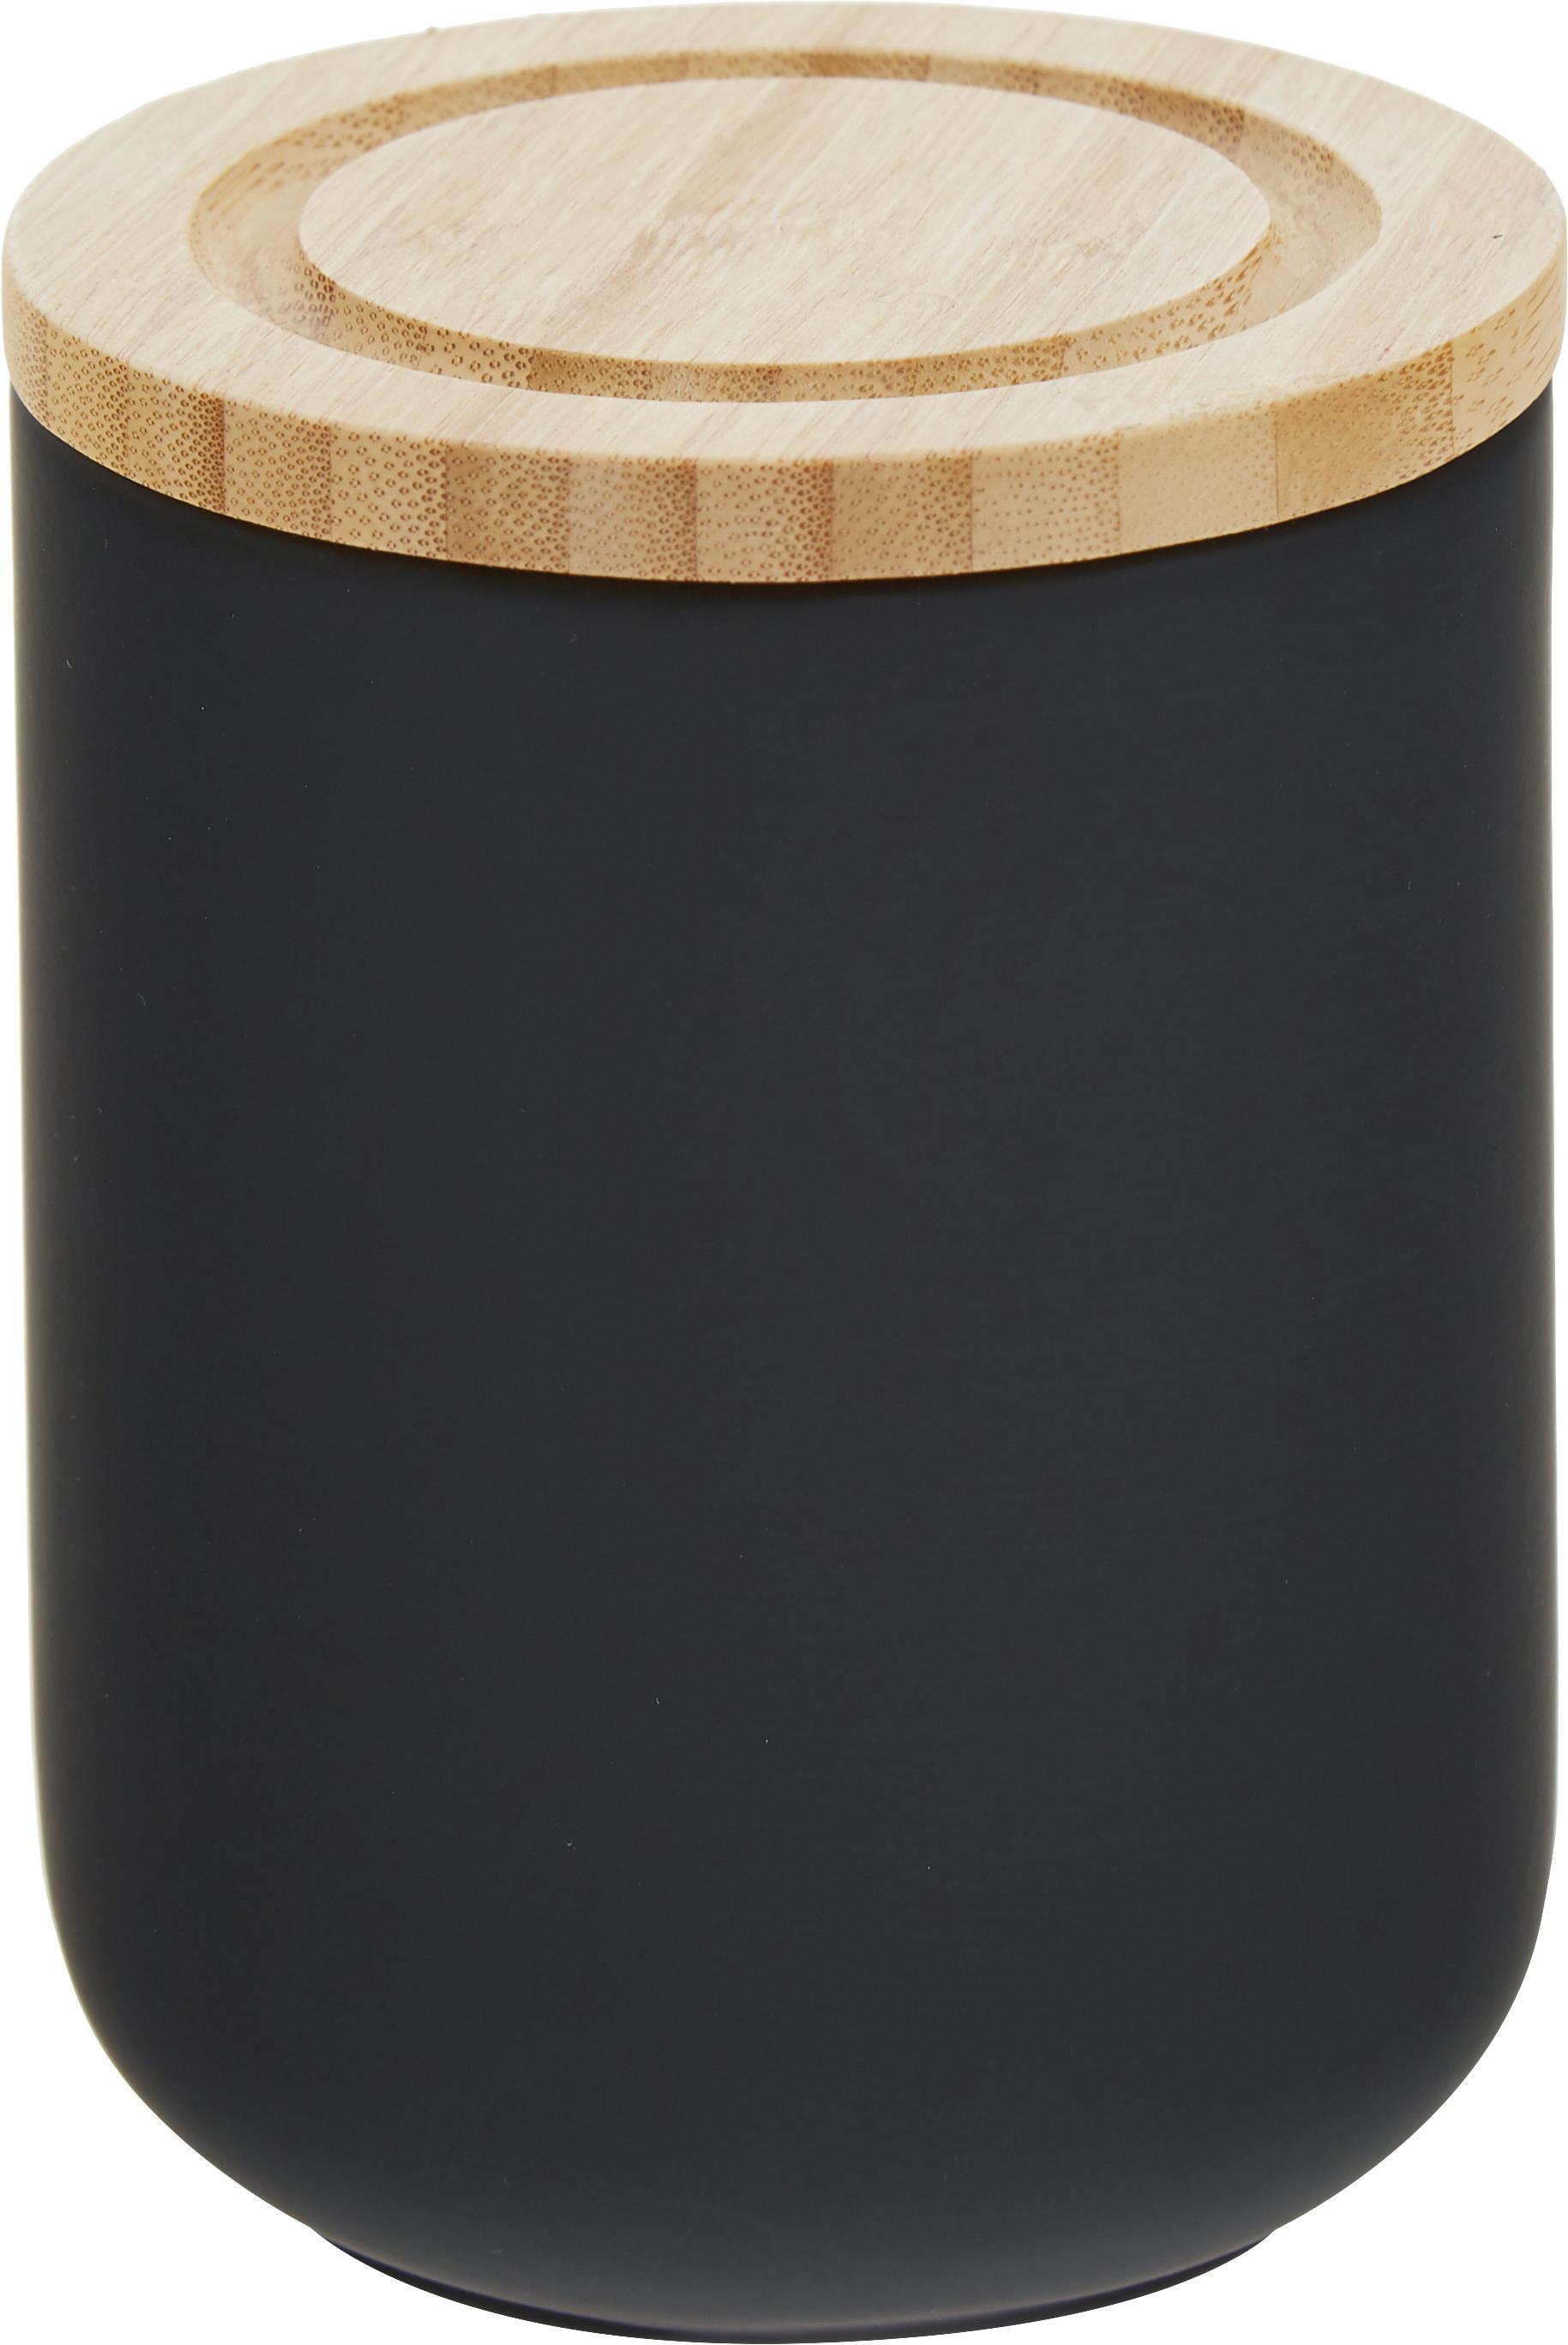 Aufbewahrungsdose Stak, Dose: Keramik, Deckel: Bambusholz, Schwarz, Bambus, Ø 10 x H 13 cm